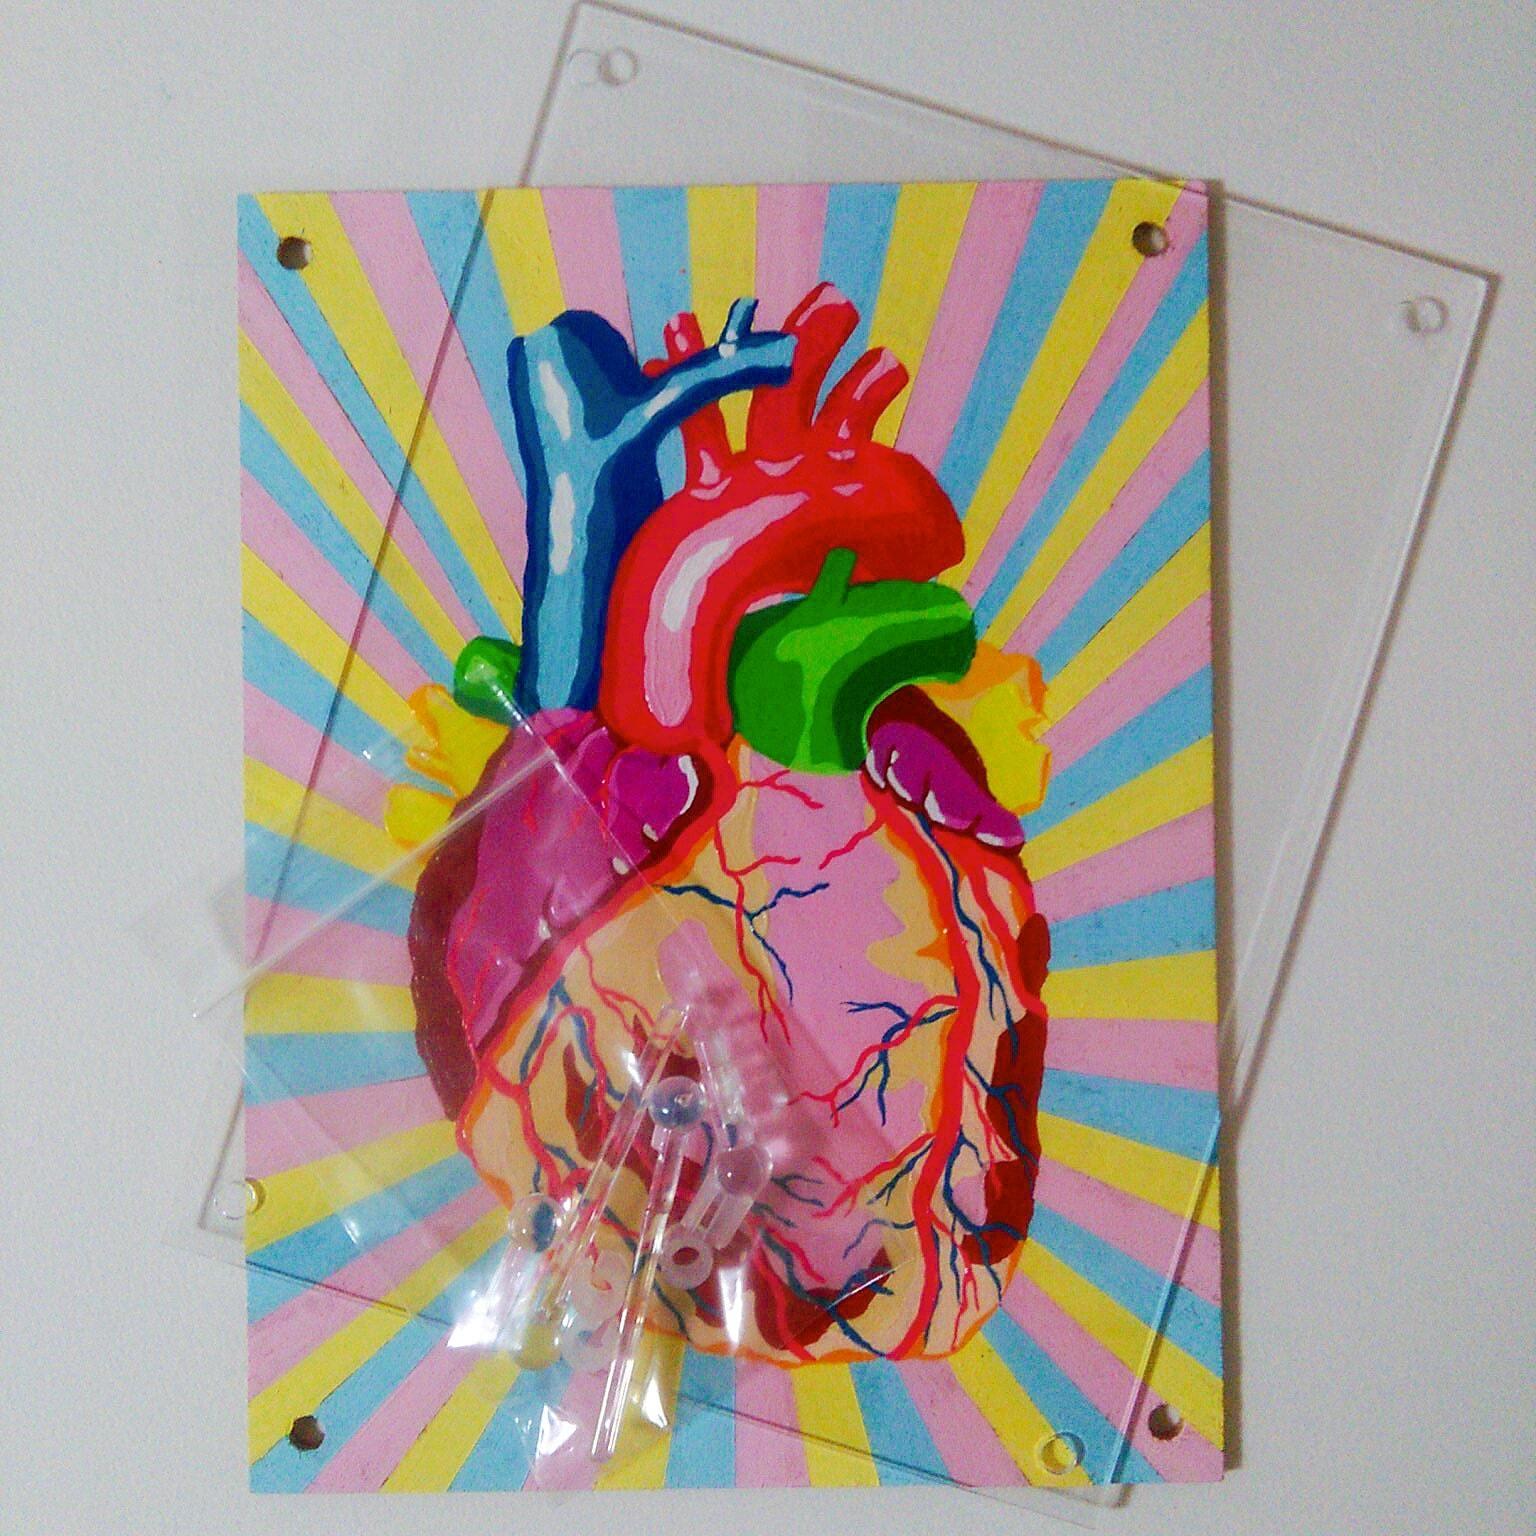 HEART WOMAN (2019) & HEART (2020) / 18cm×13.5cm / Acrylic painting / Original Drawing